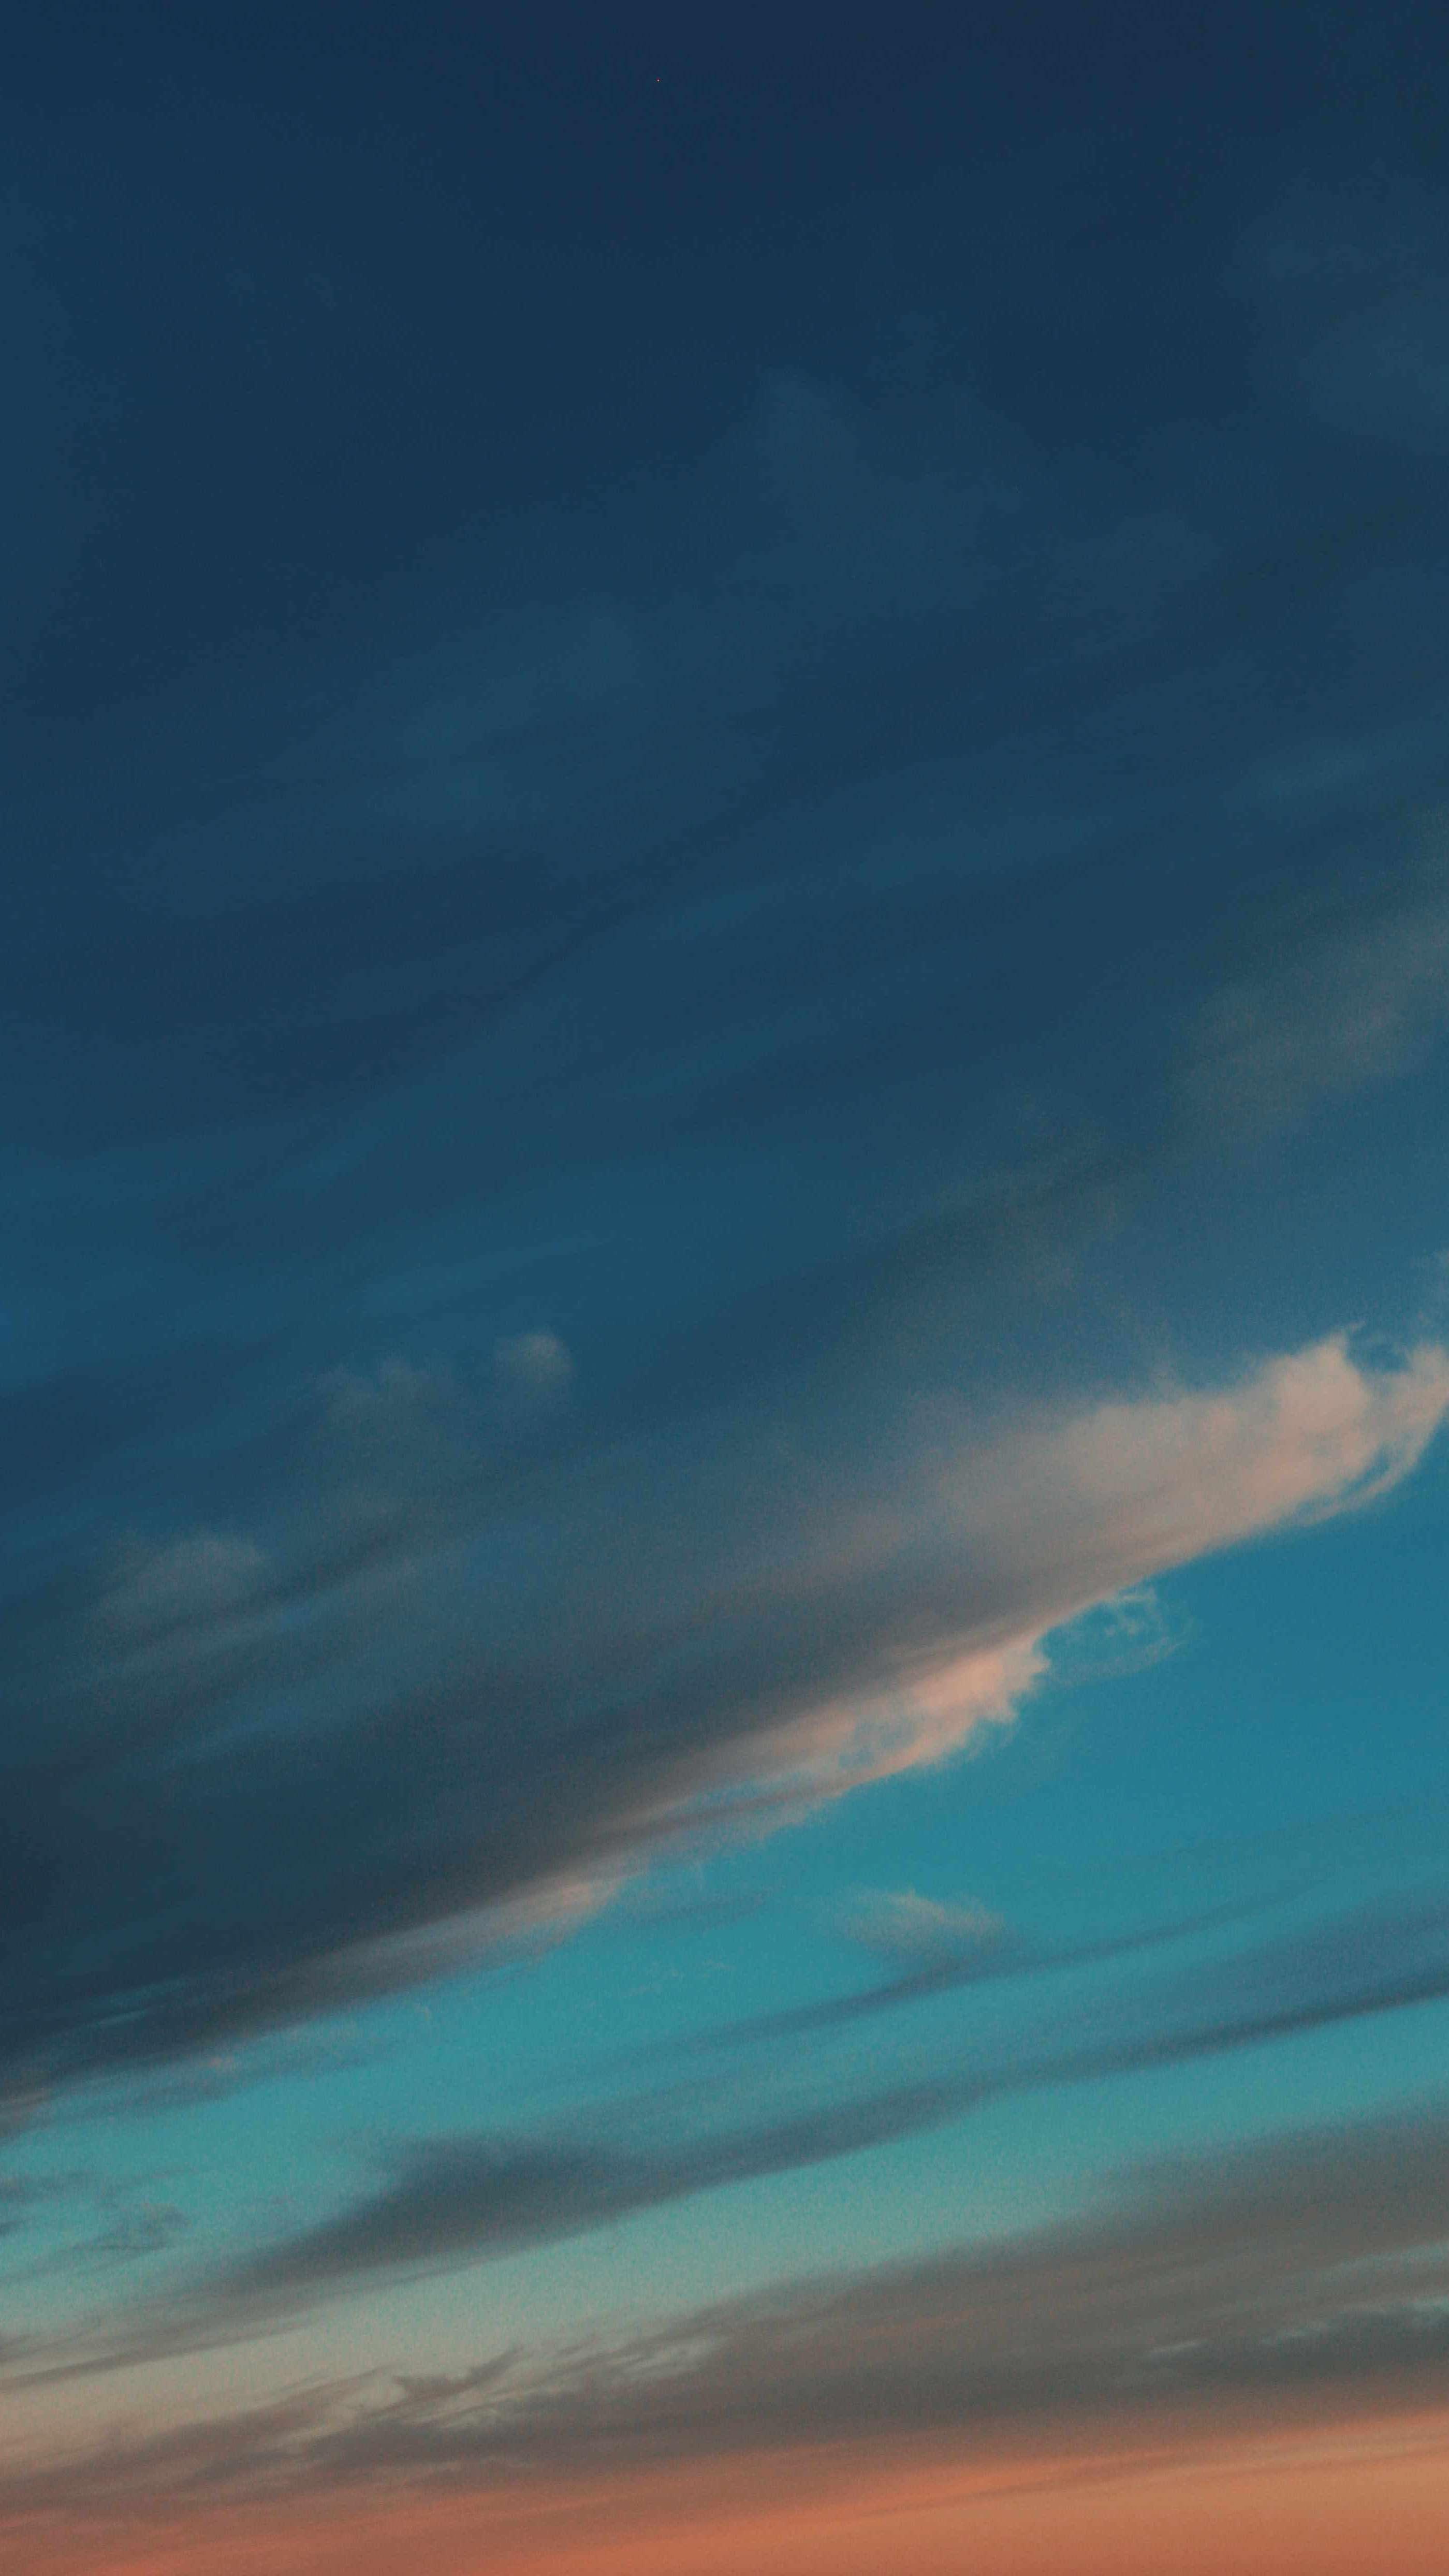 Evening Clouds iPhone Wallpaper